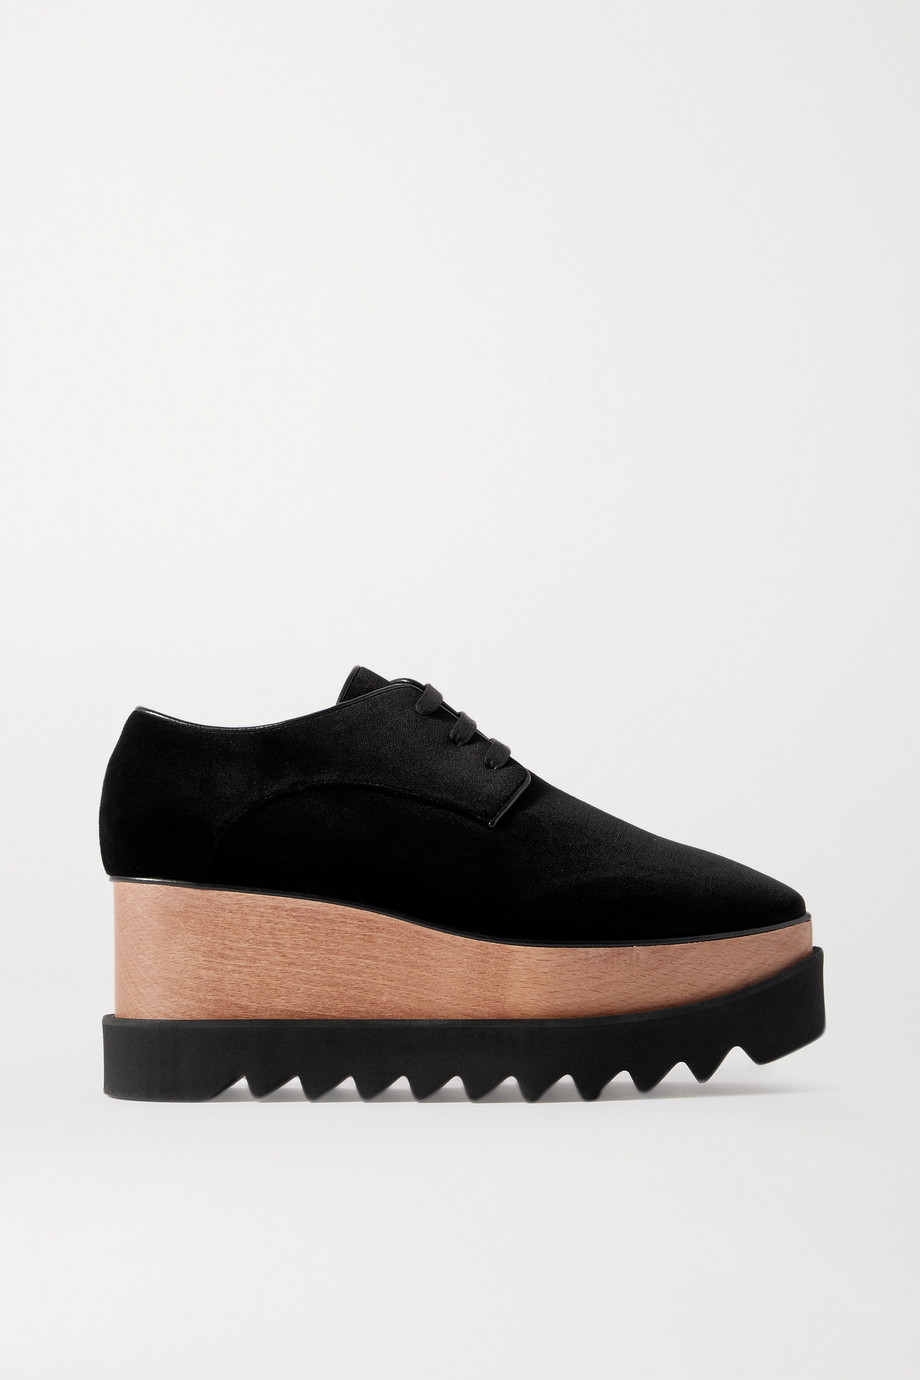 Stella McCartney Elyse velvet platform sneakers